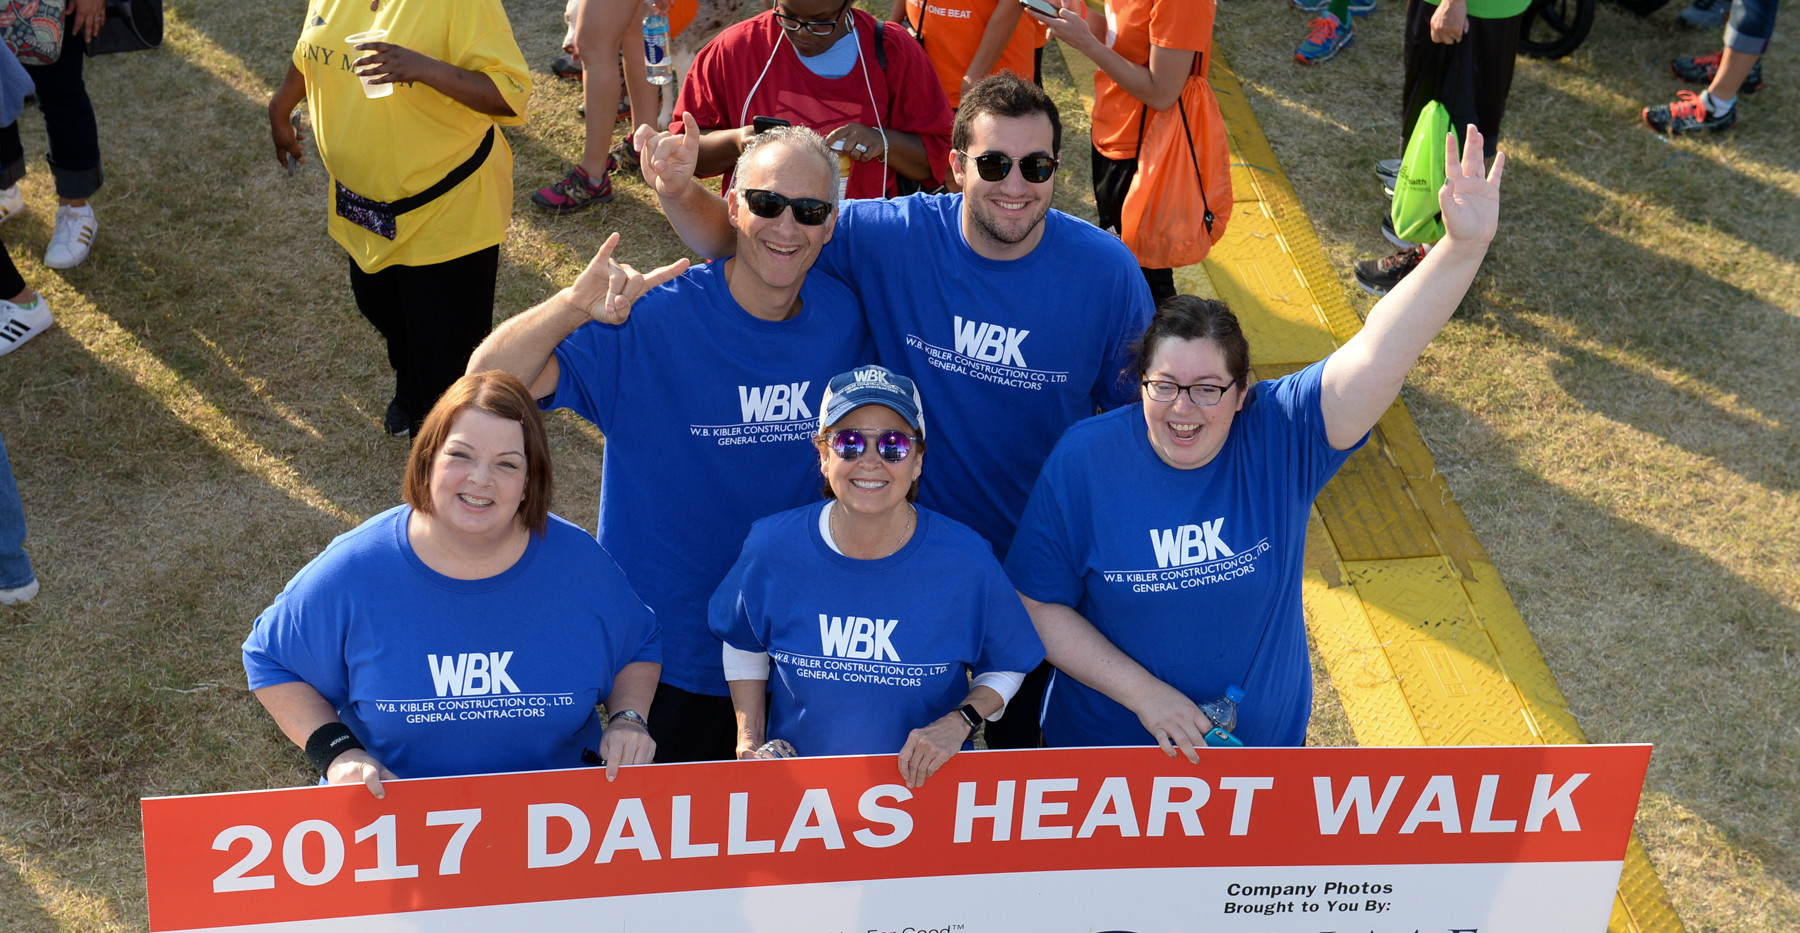 American Heart Walk - WBK Company Photo.